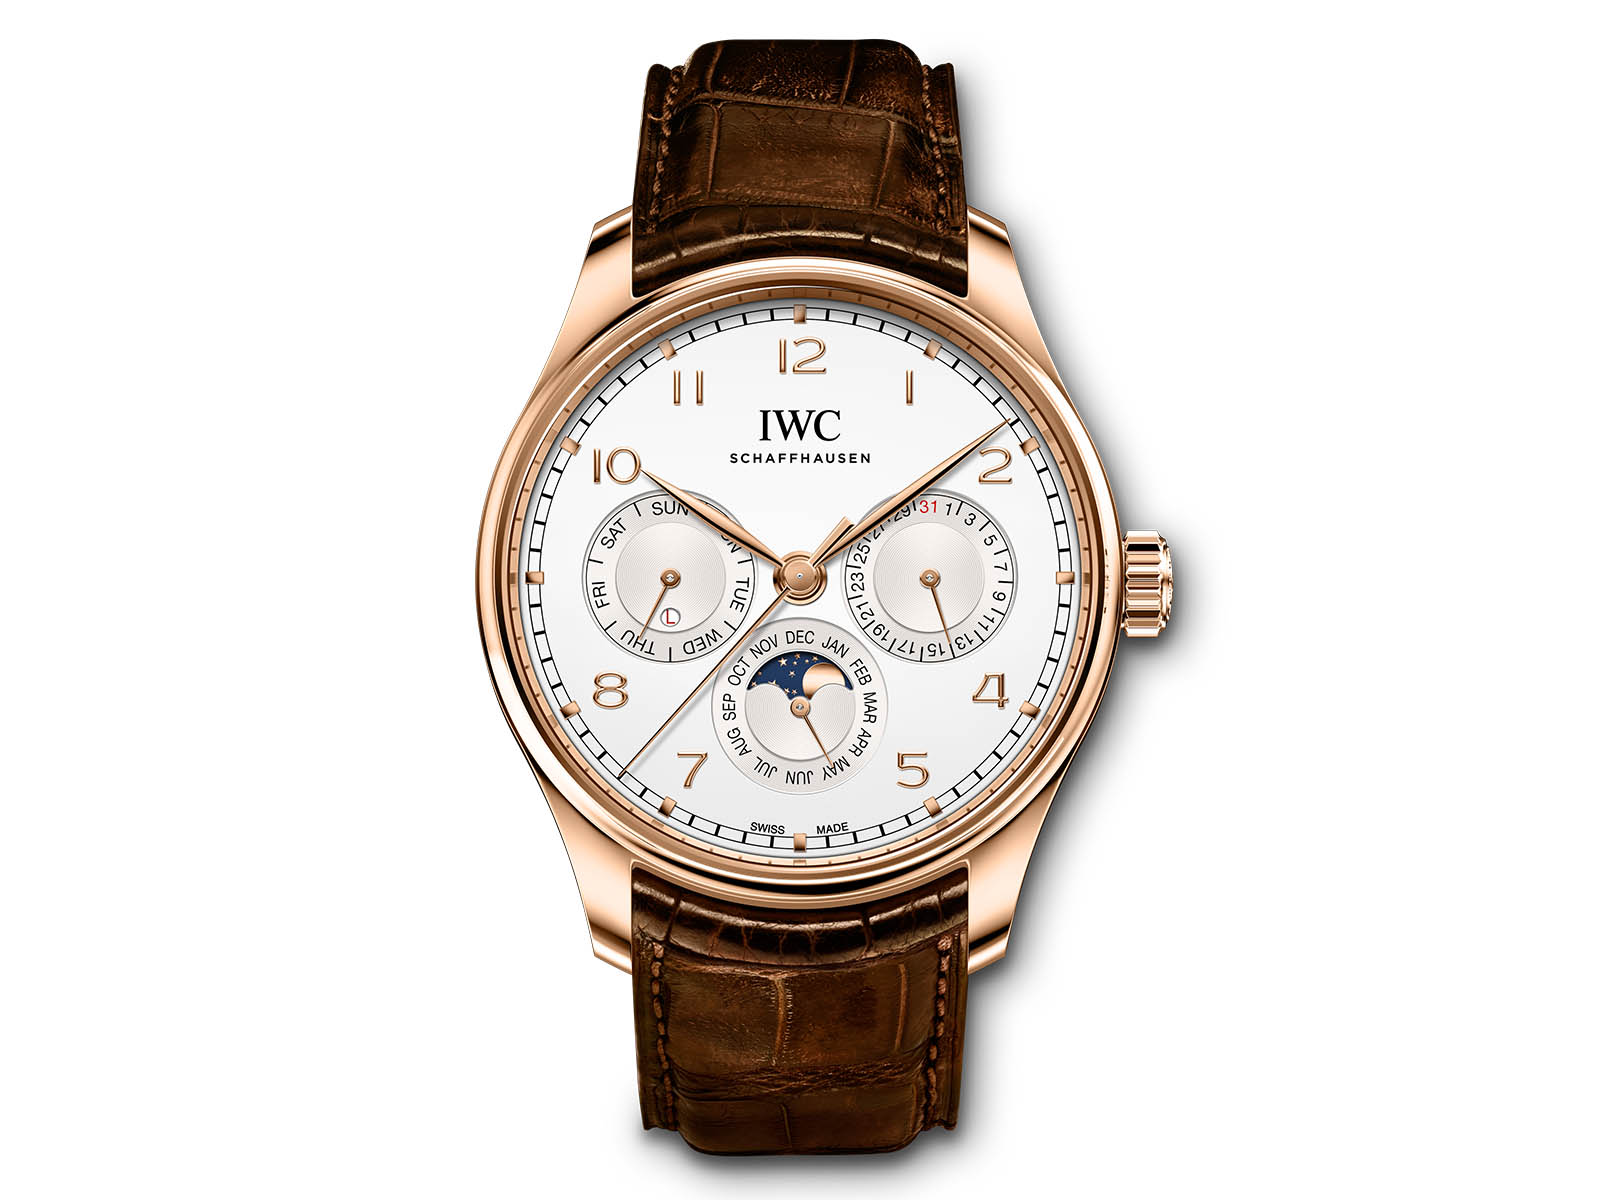 iw344202-iwc-schaffhausen-portugieser-perpetual-calendar-42-watches-wonders-2020-1.jpg